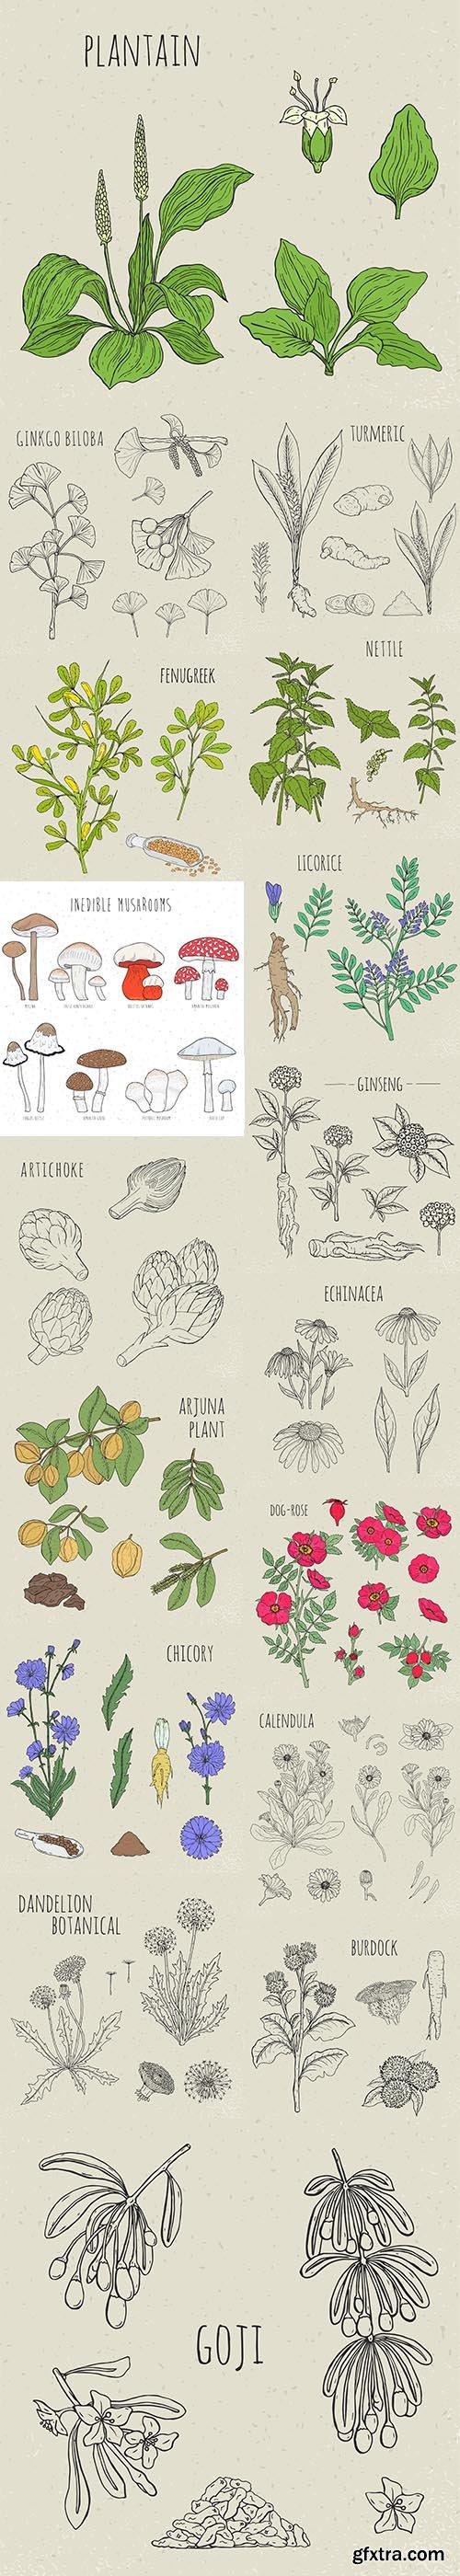 Medical Botanical Isolated Illustration Plant Flowers Leaves Hand-Drawn Set